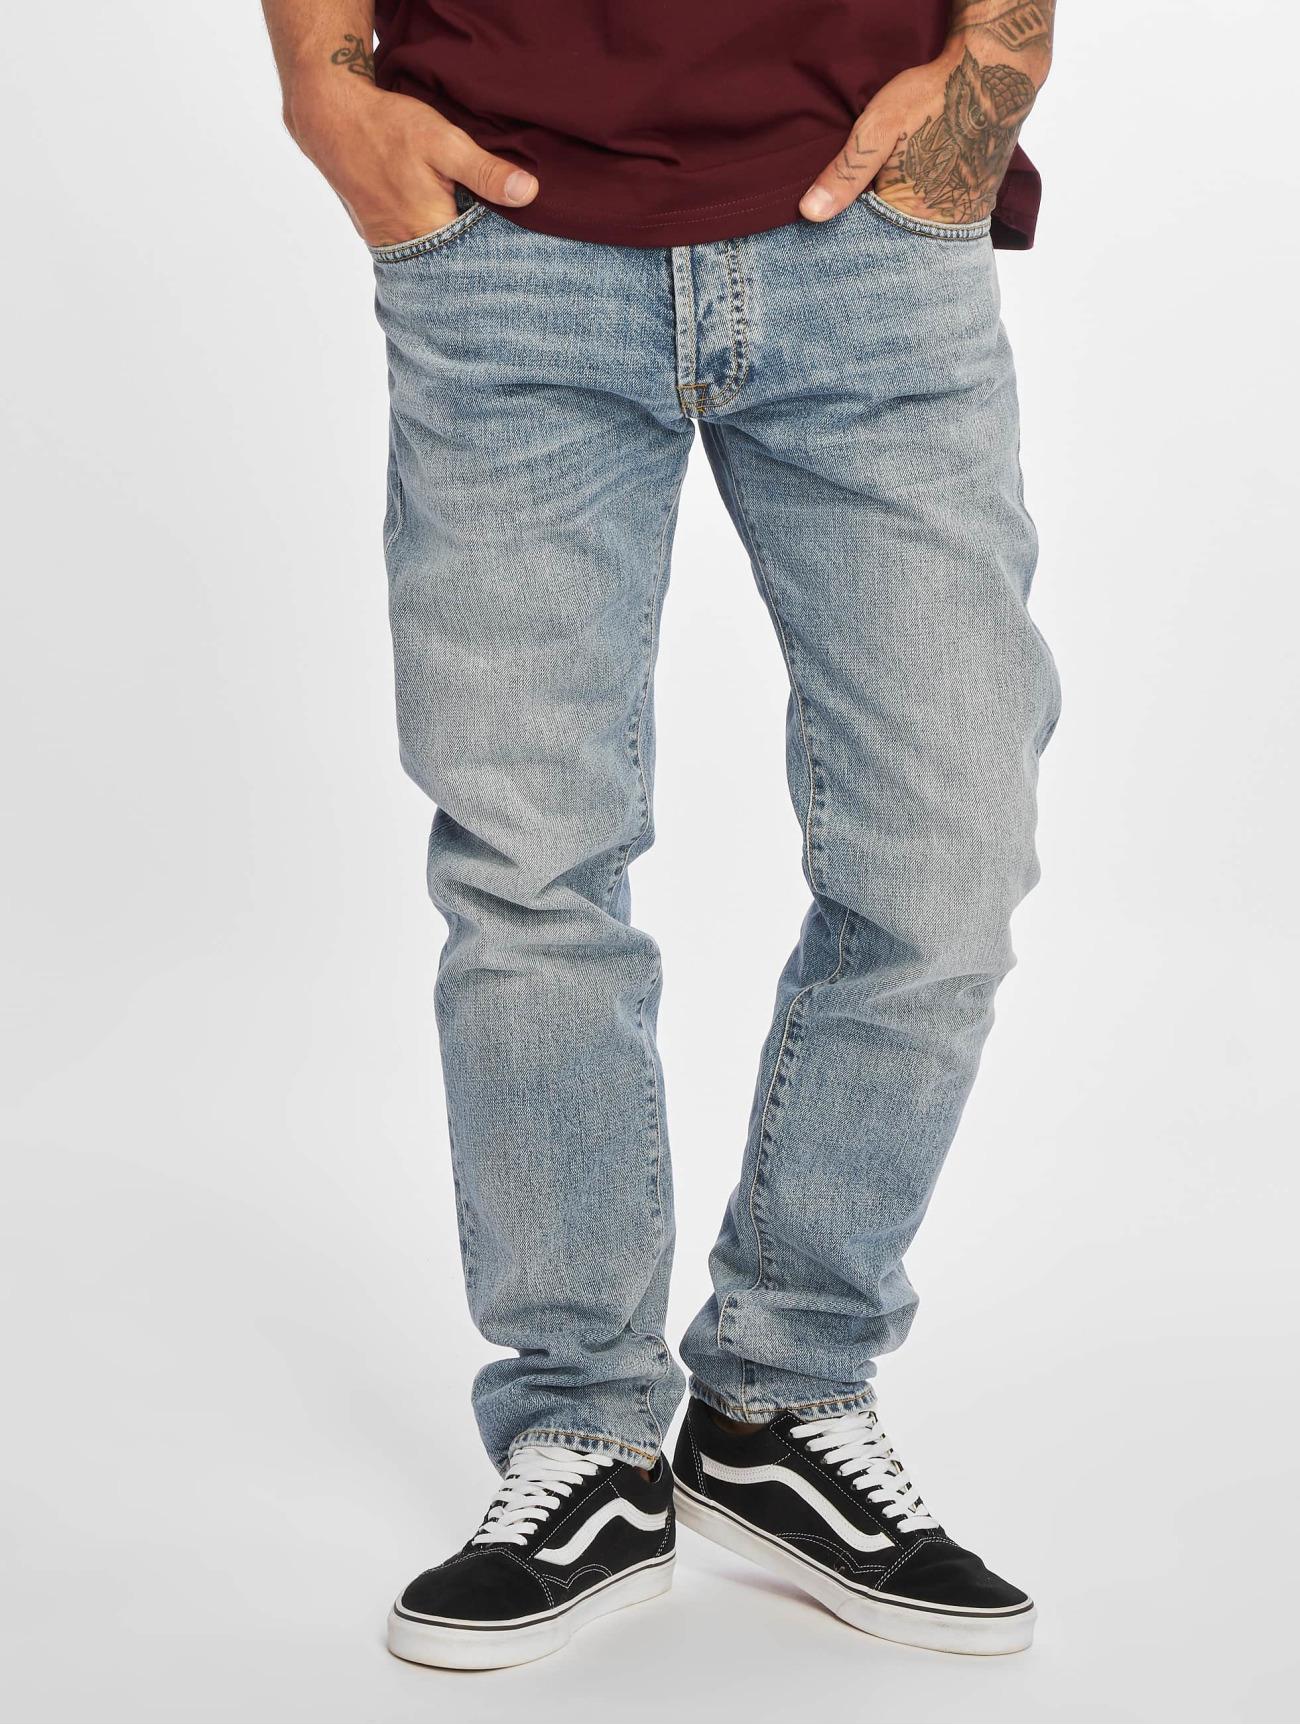 Carhartt WIP Jeans / Straight Fit Jeans Klondike  i blå 695996 Män Jeans